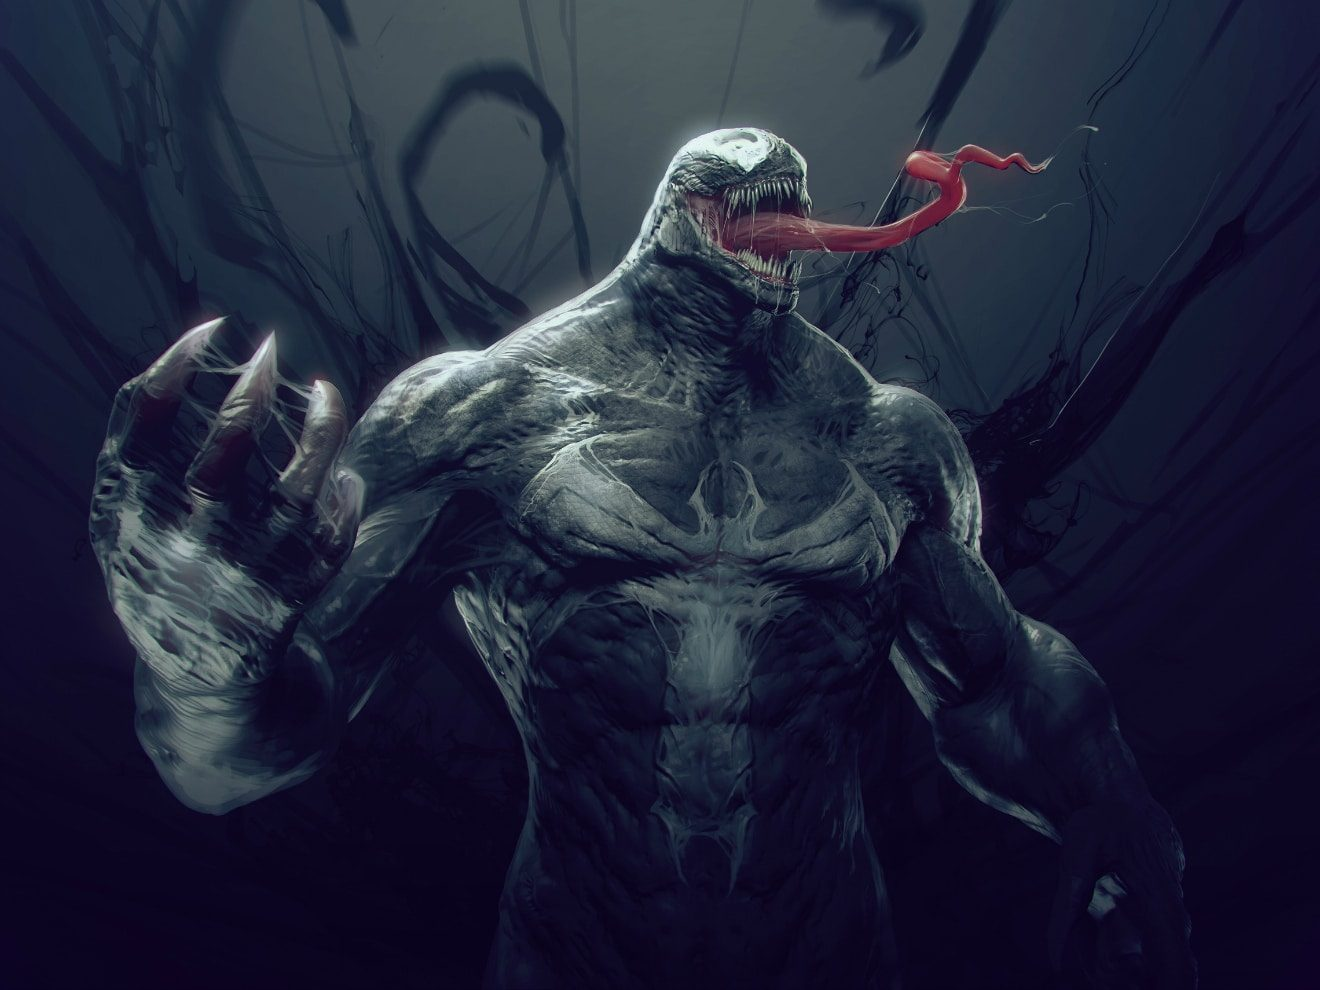 Marvel Entertainment's Venom gets own spin-off movie